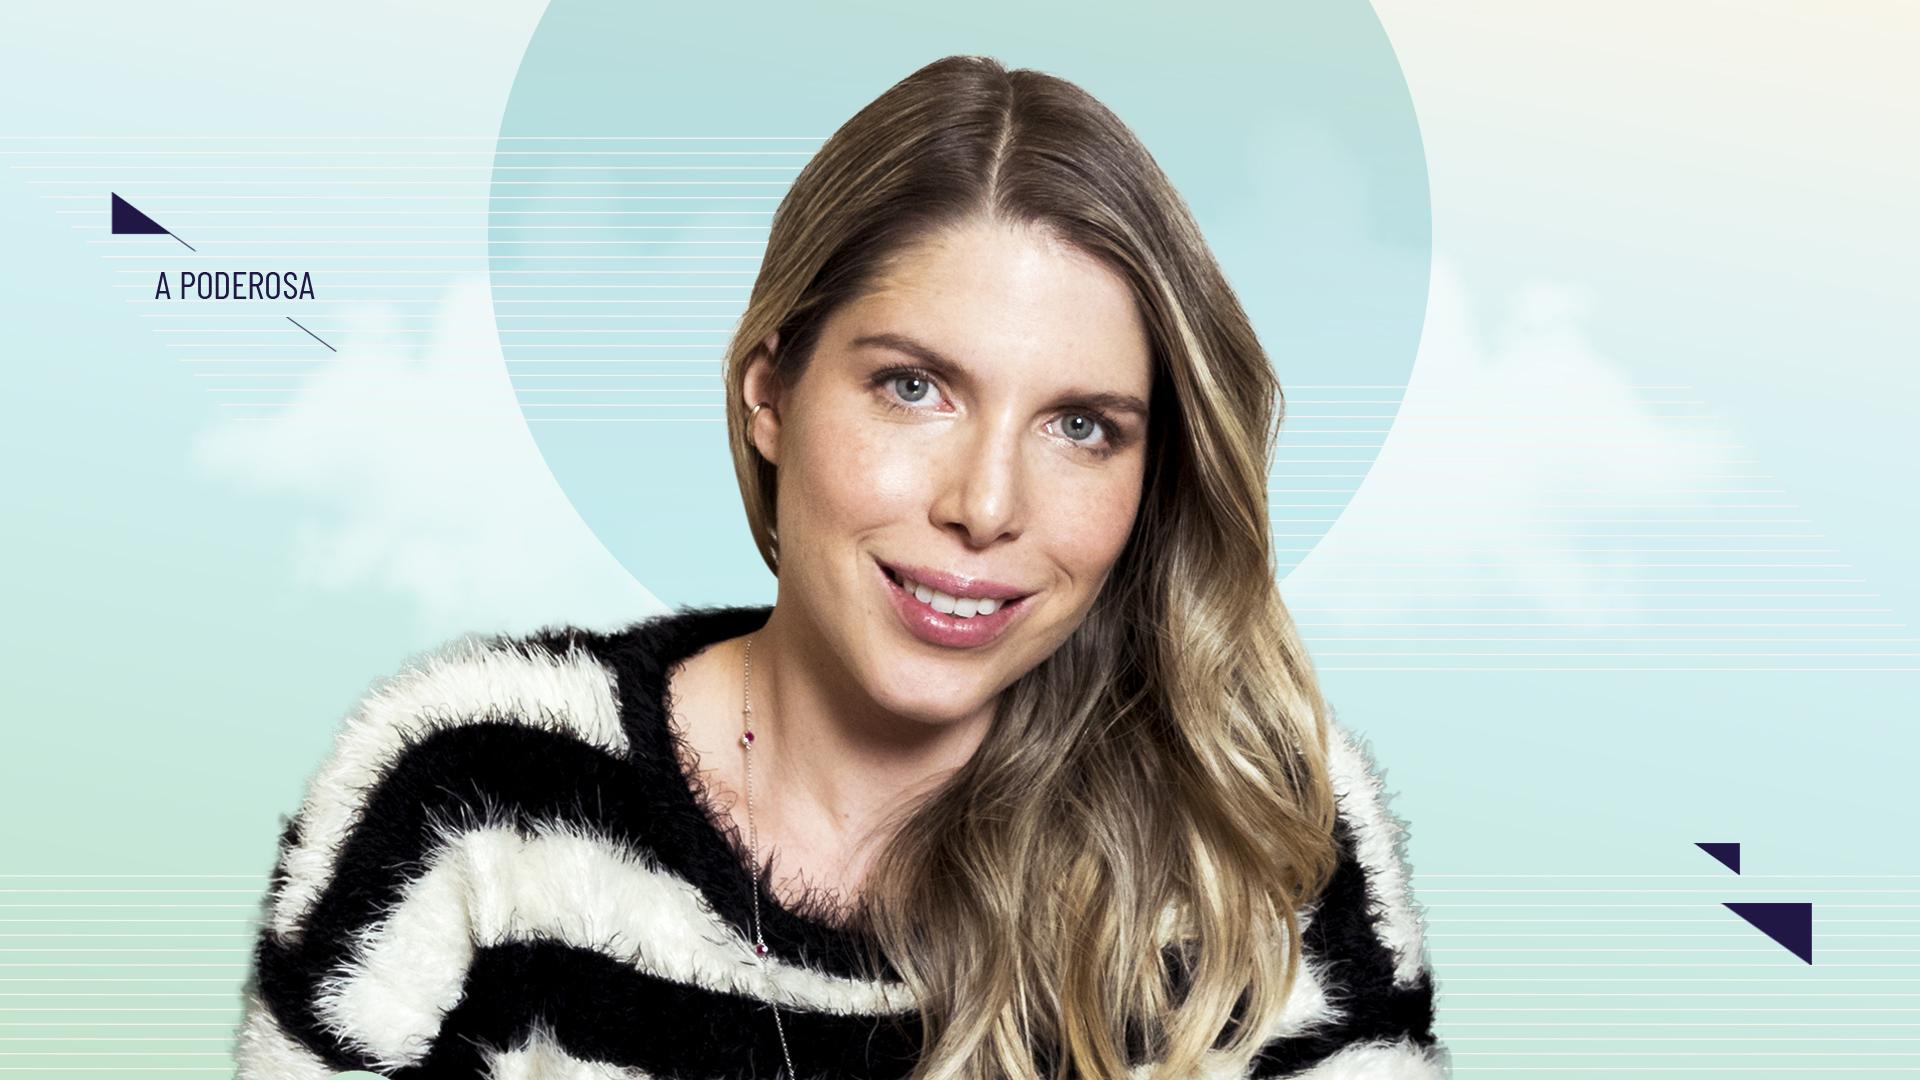 A poderosa | Herdeira da Riachuelo fez marca virar gigante da moda mundial